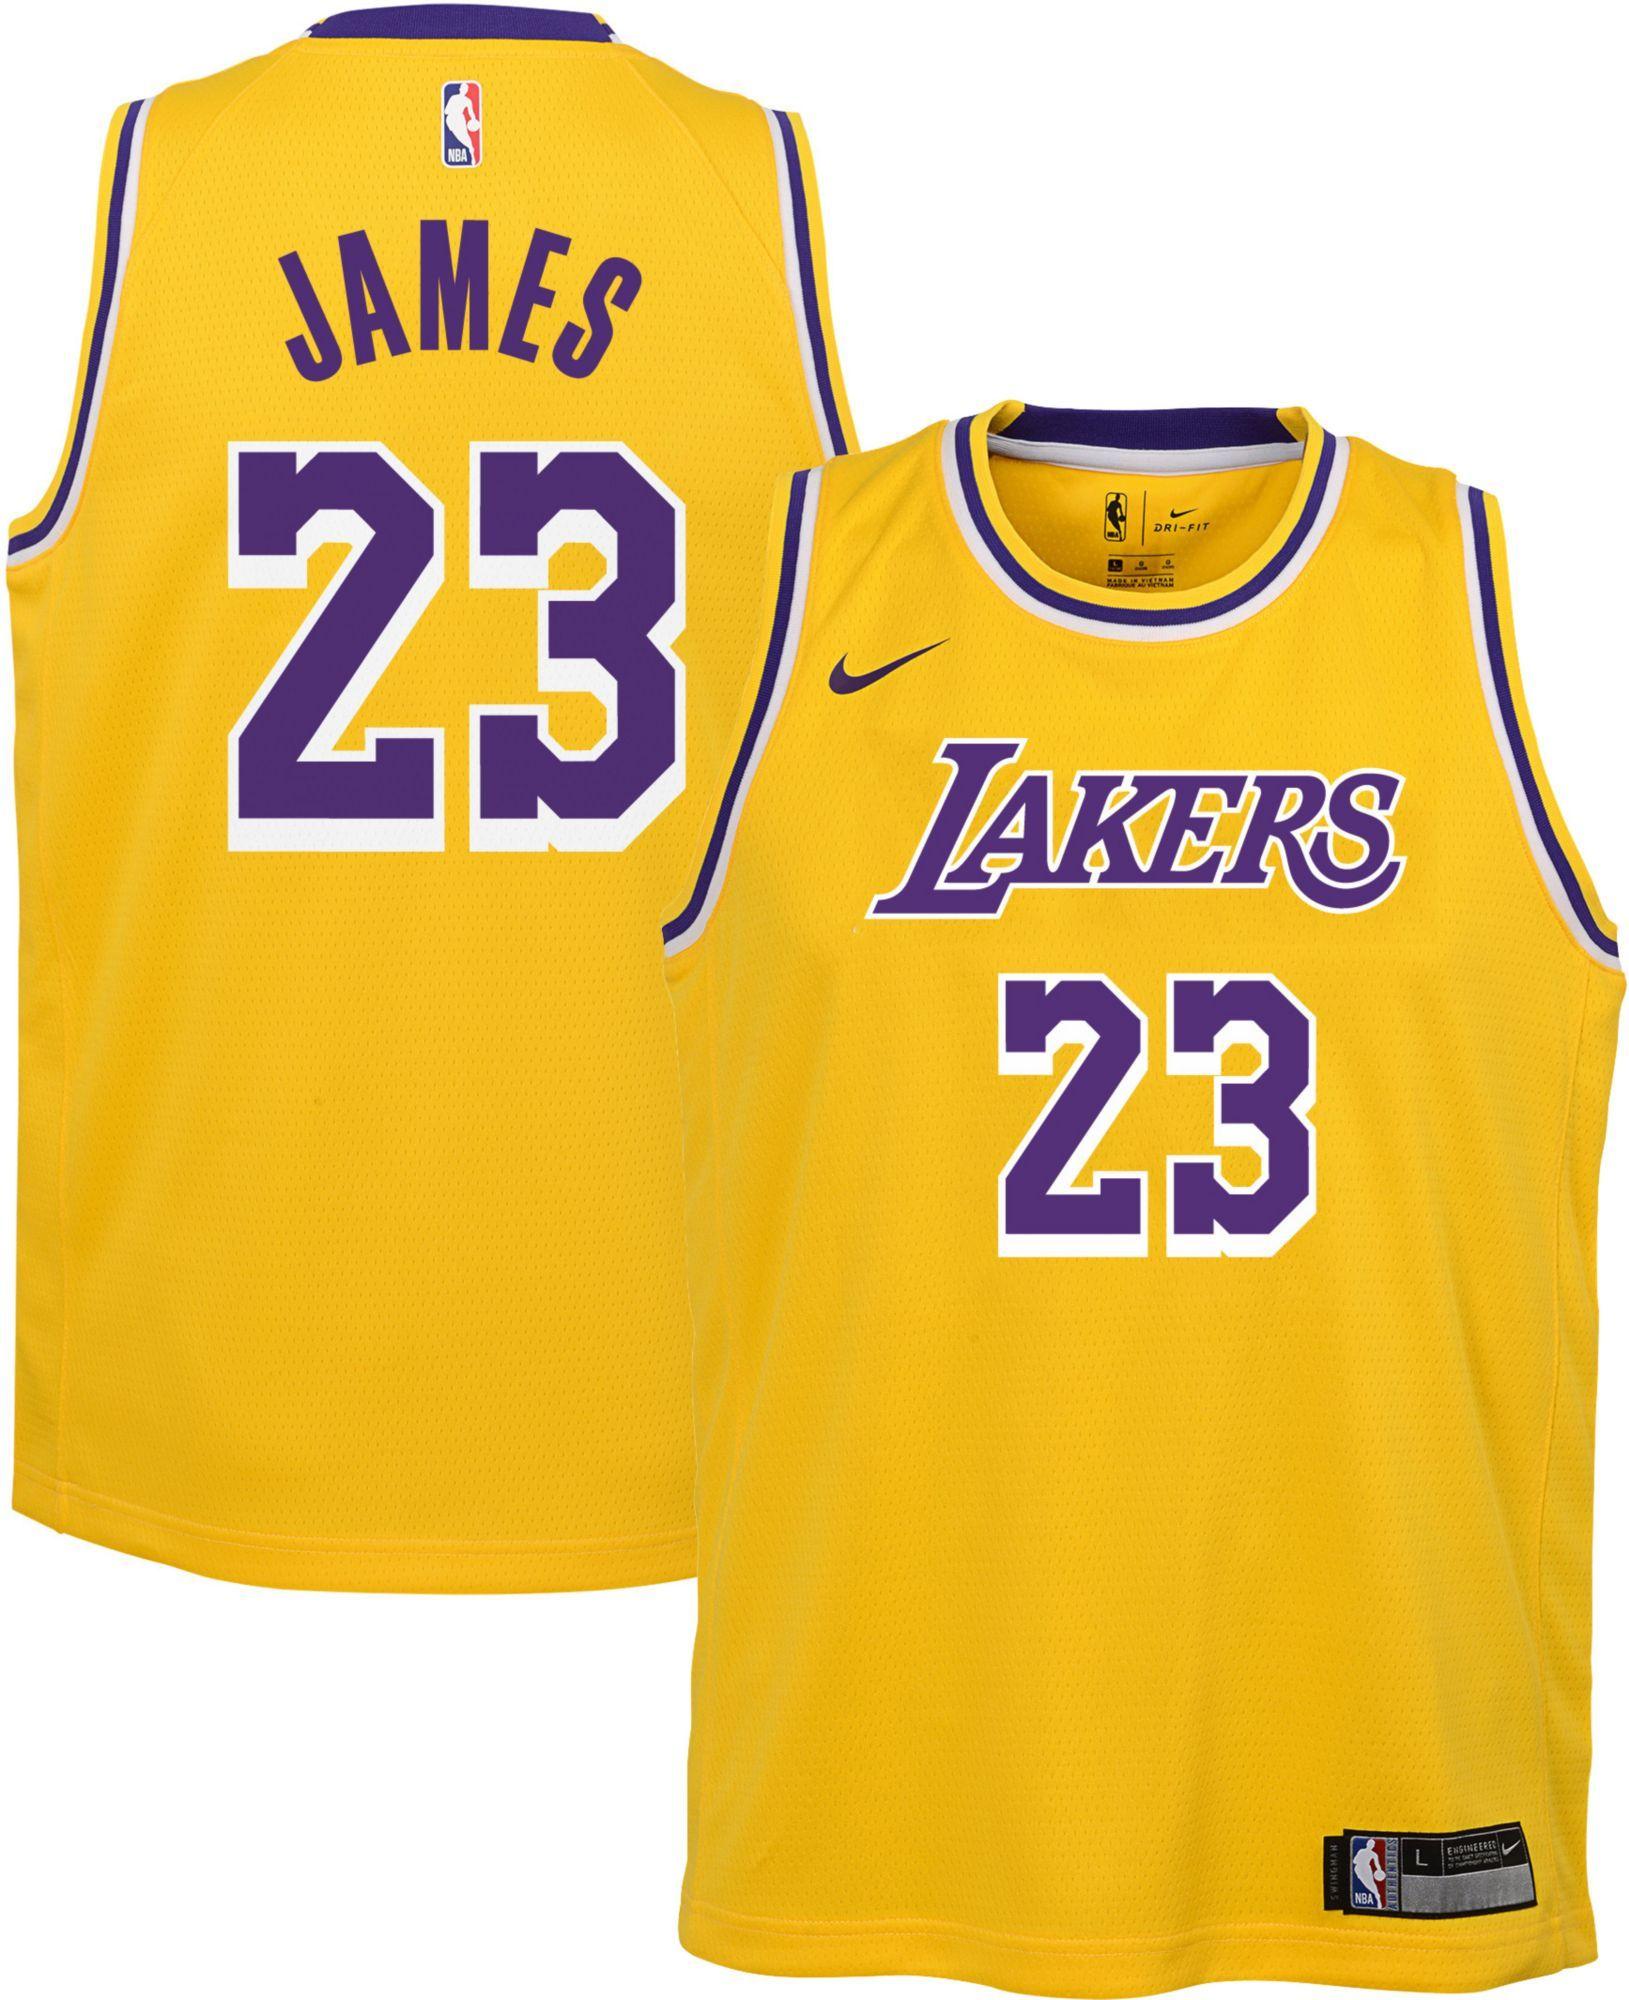 feaeadc33cb9 Nike Boys  Los Angeles Lakers LeBron James  23 Gold Dri-FIT Swingman  Jersey